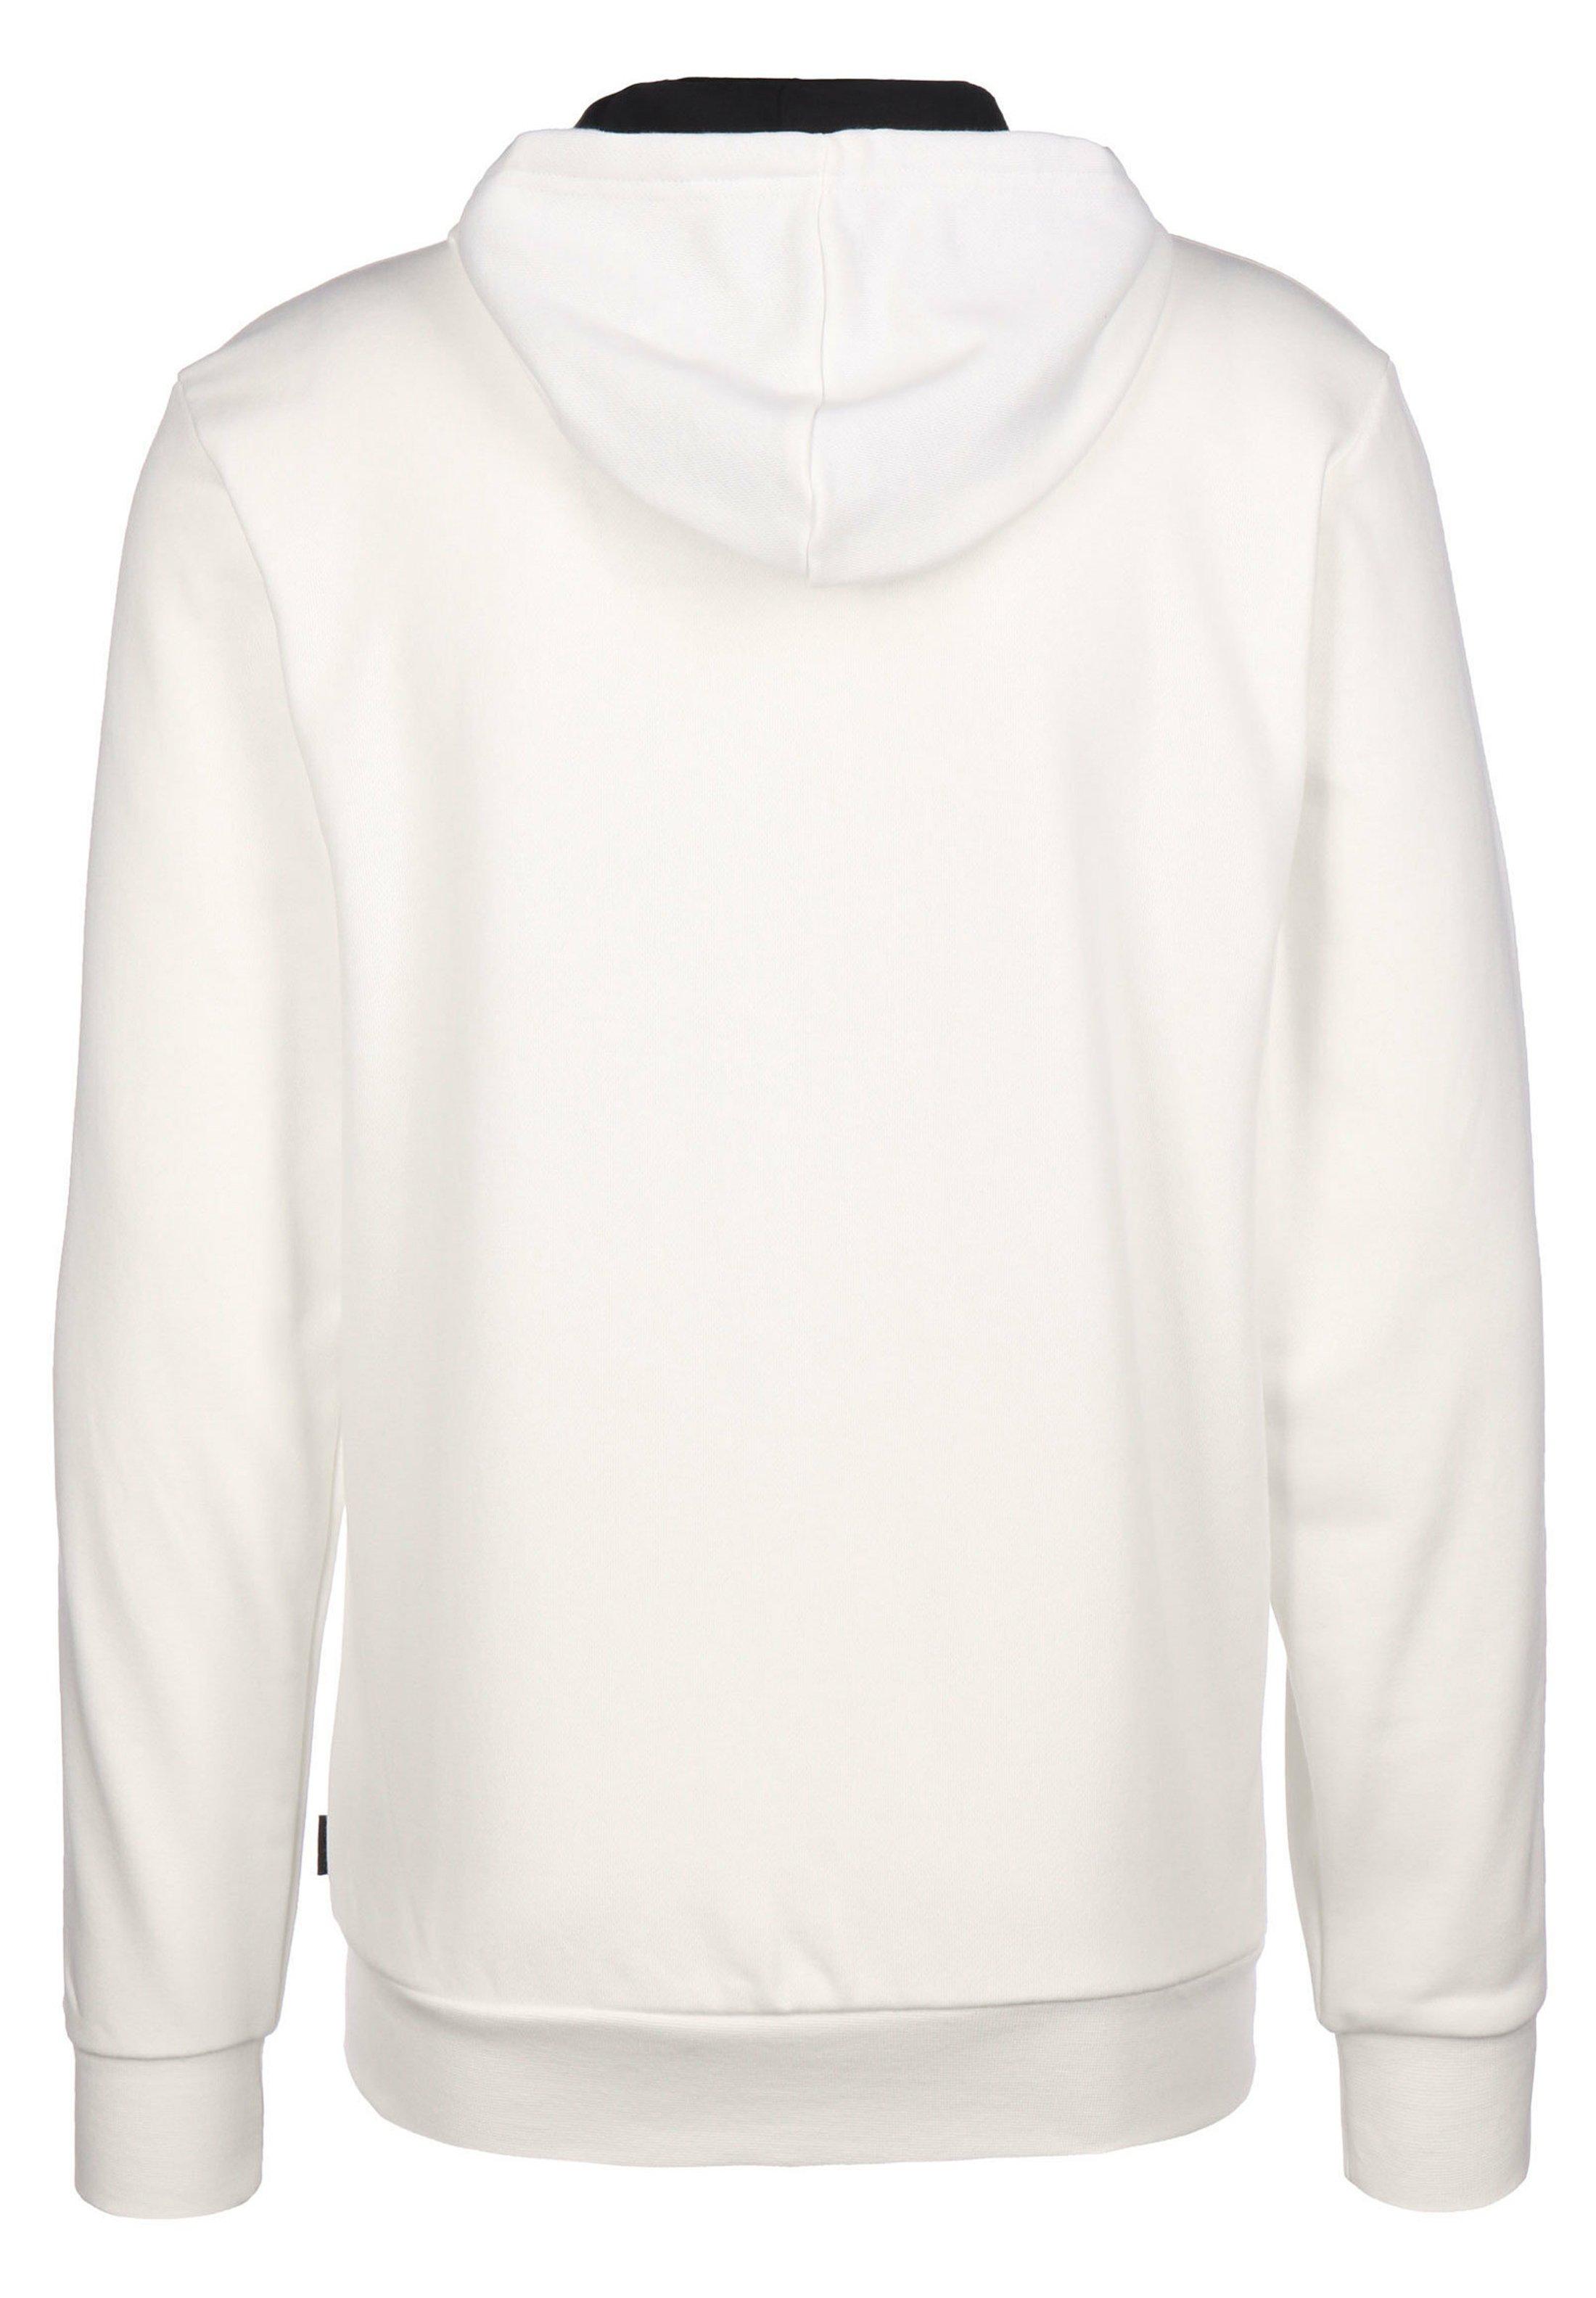 adidas Performance JUVENTUS TURIN KAPUZENJACKE HERREN - Bluza rozpinana - core white / black